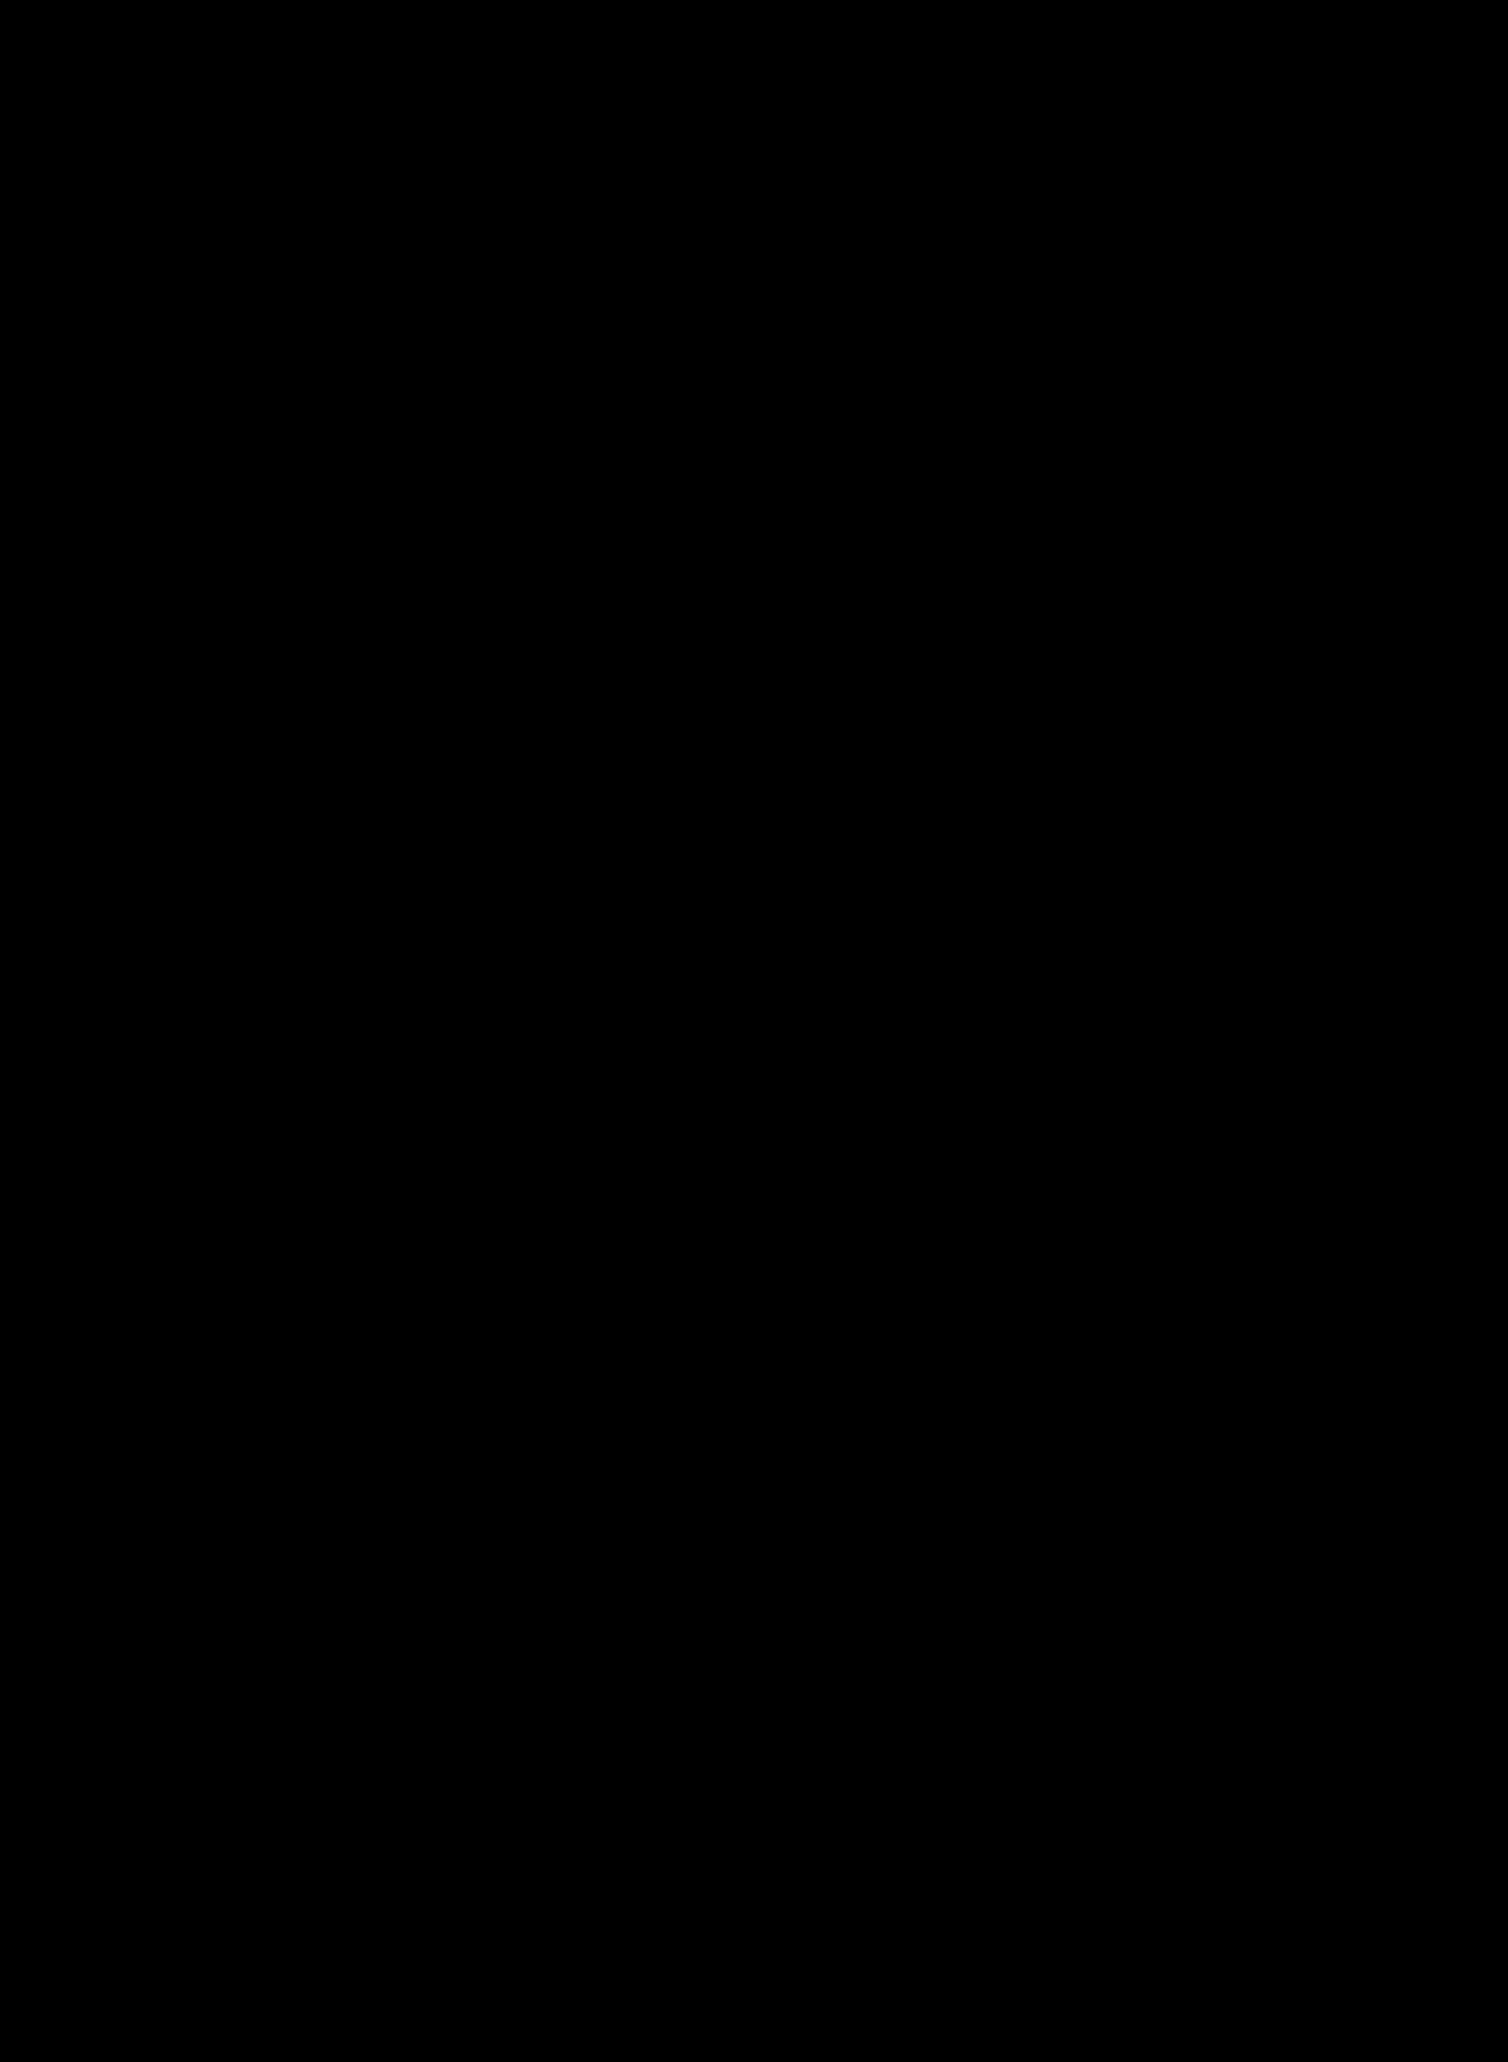 1508x2062 Clipart